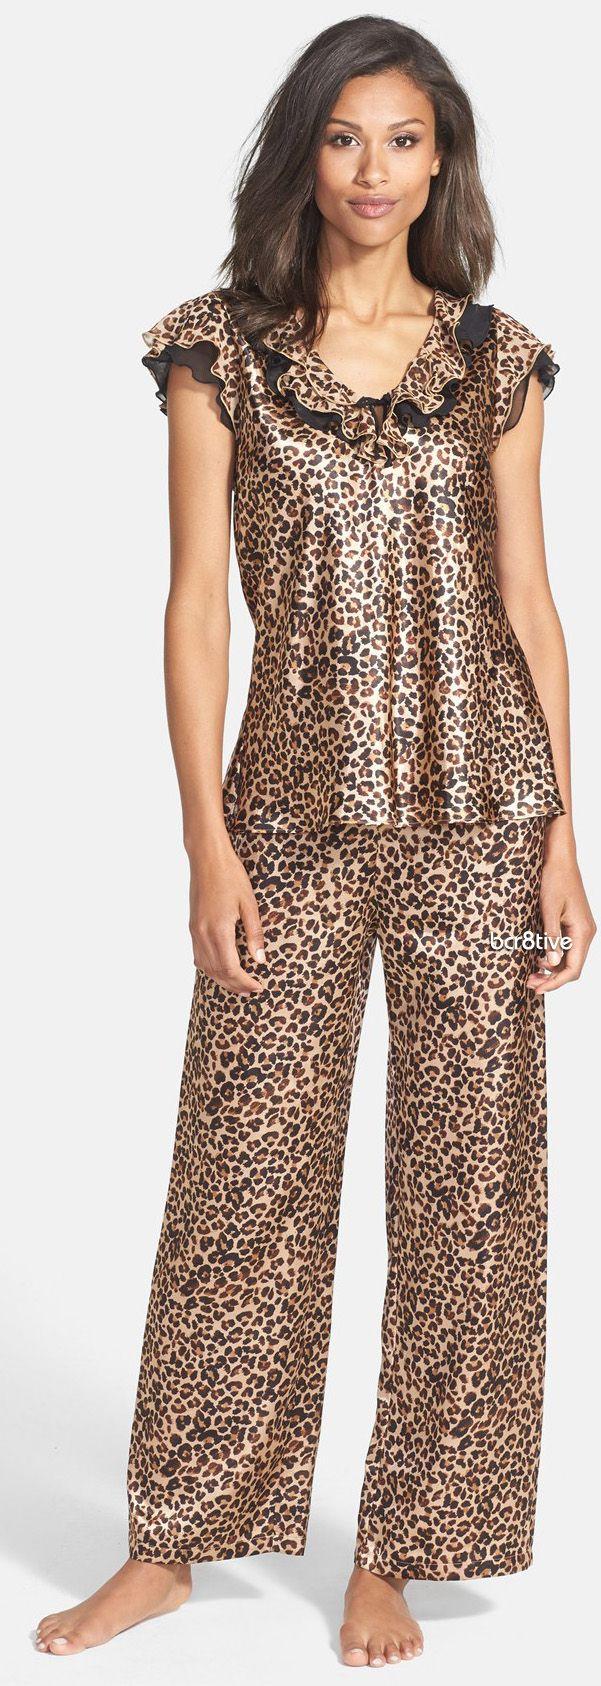 Oscar de la Renta Pajamas #AnimalPrint